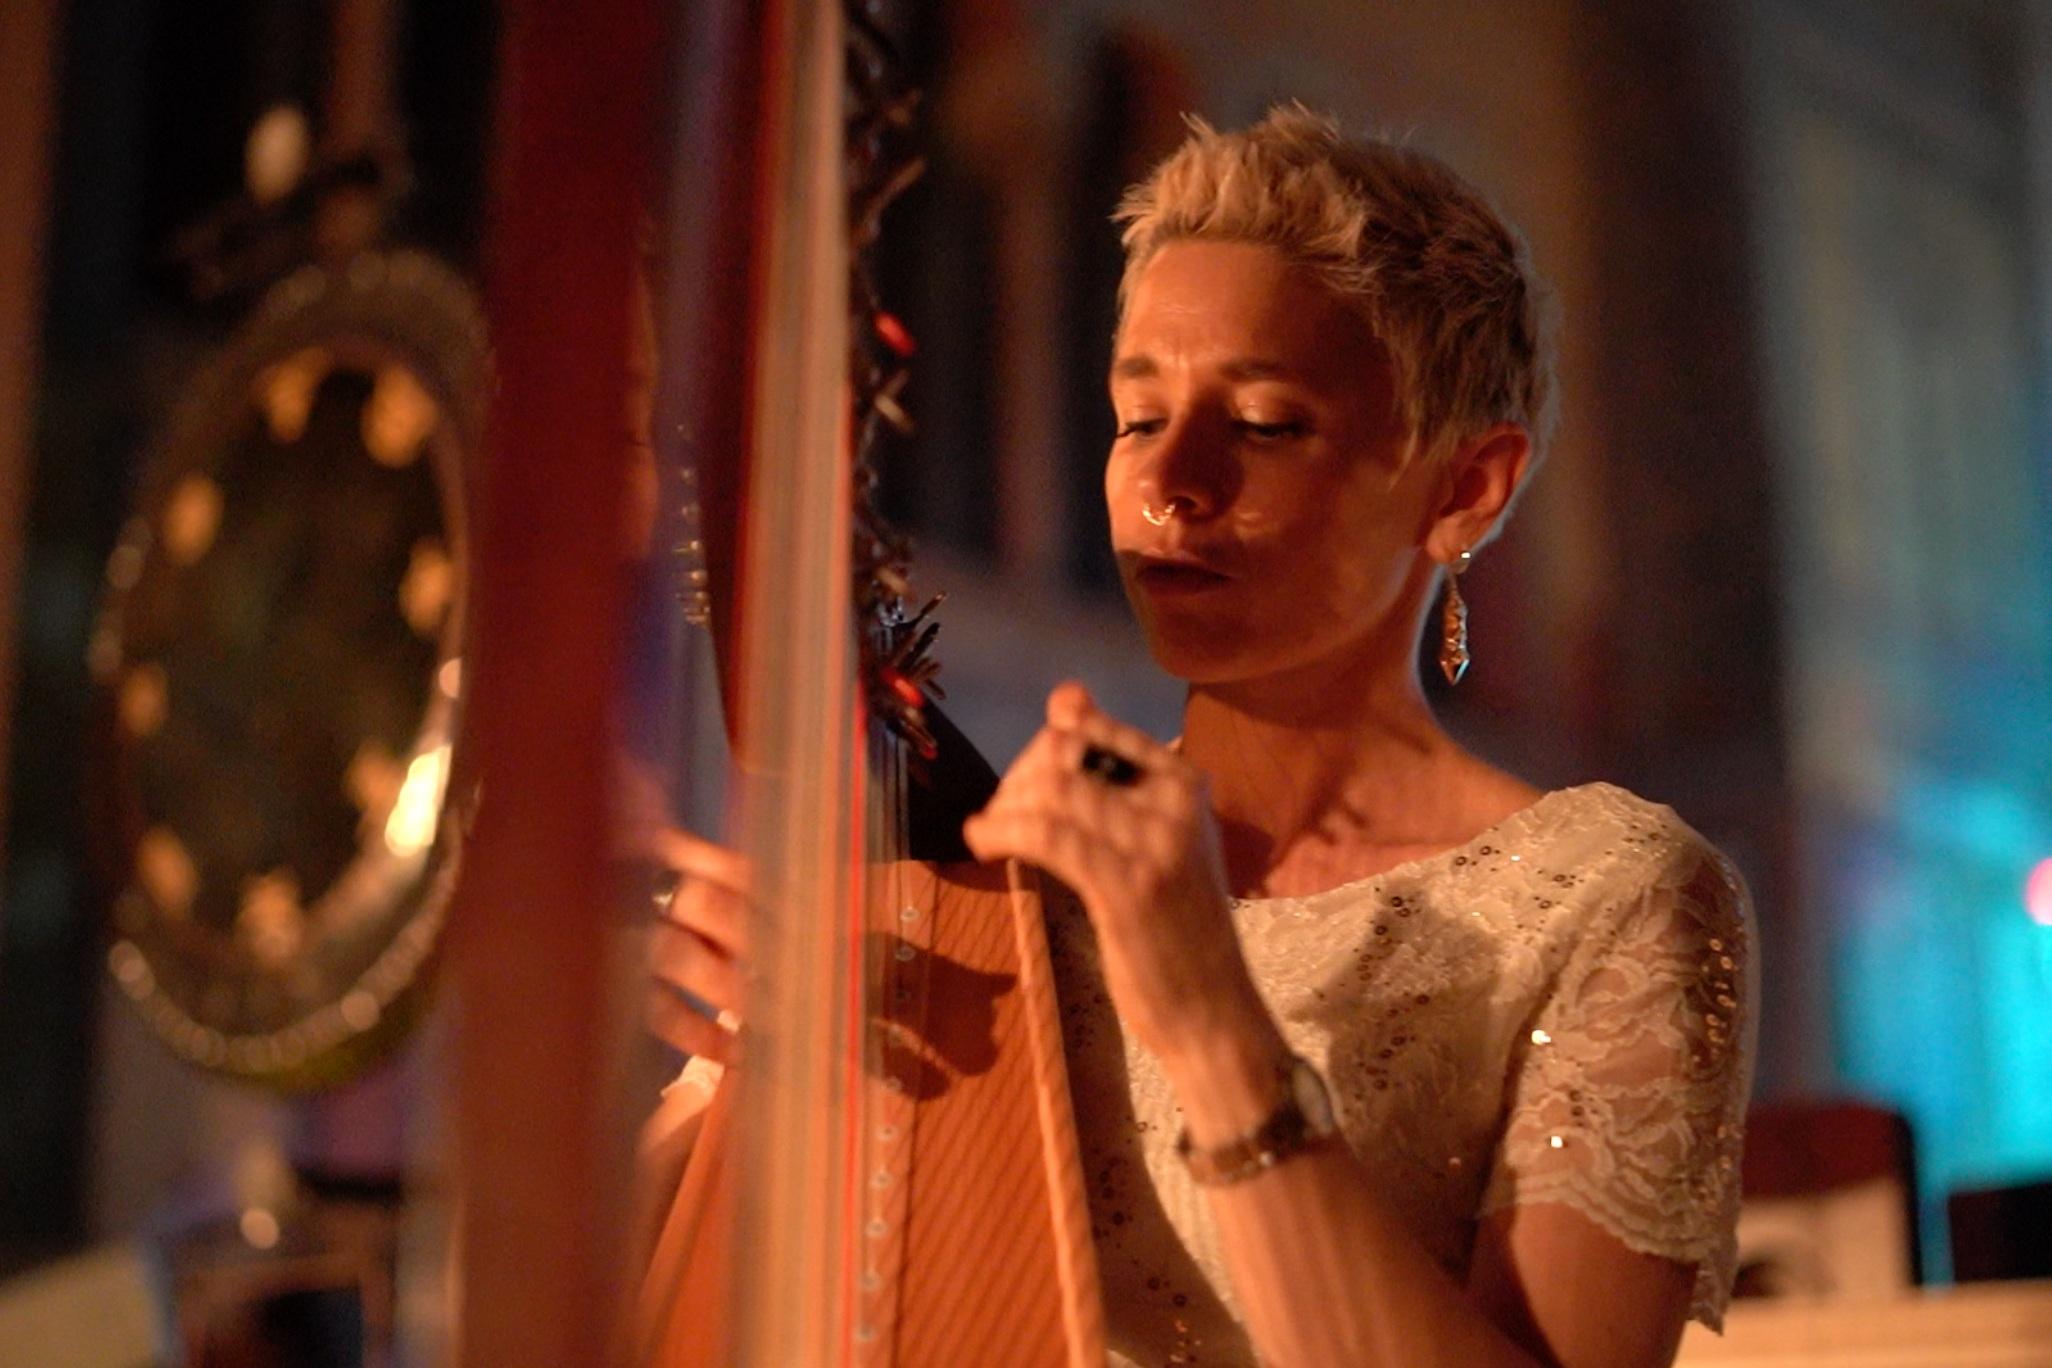 Caroline Campbell - Harpist, Intuitive Sound Healer, Psych Student, Reiki Masterinstagram.com/harpimpressions